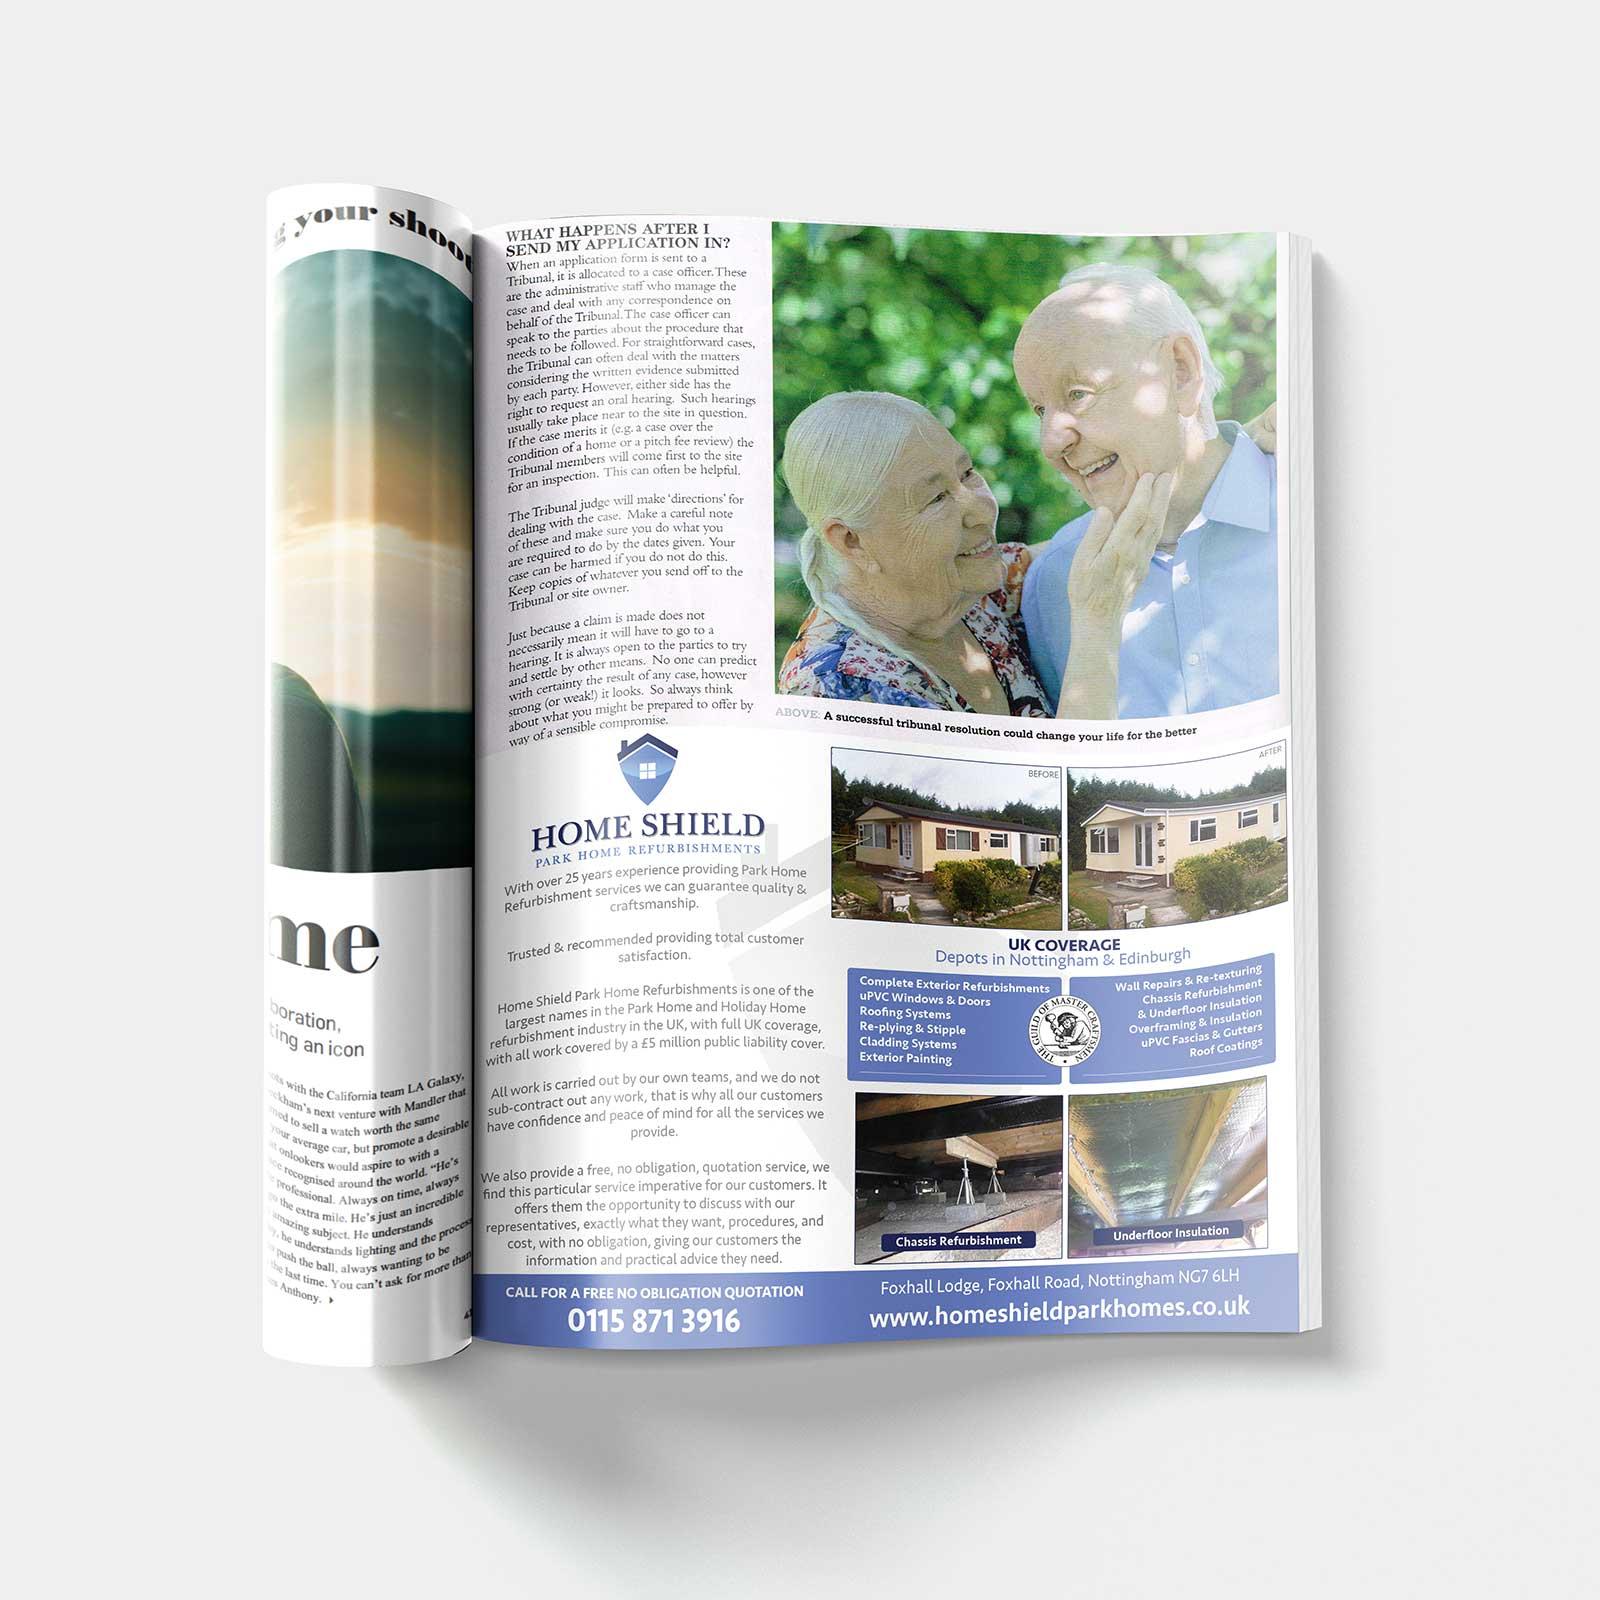 Home Shield - A5 Advert